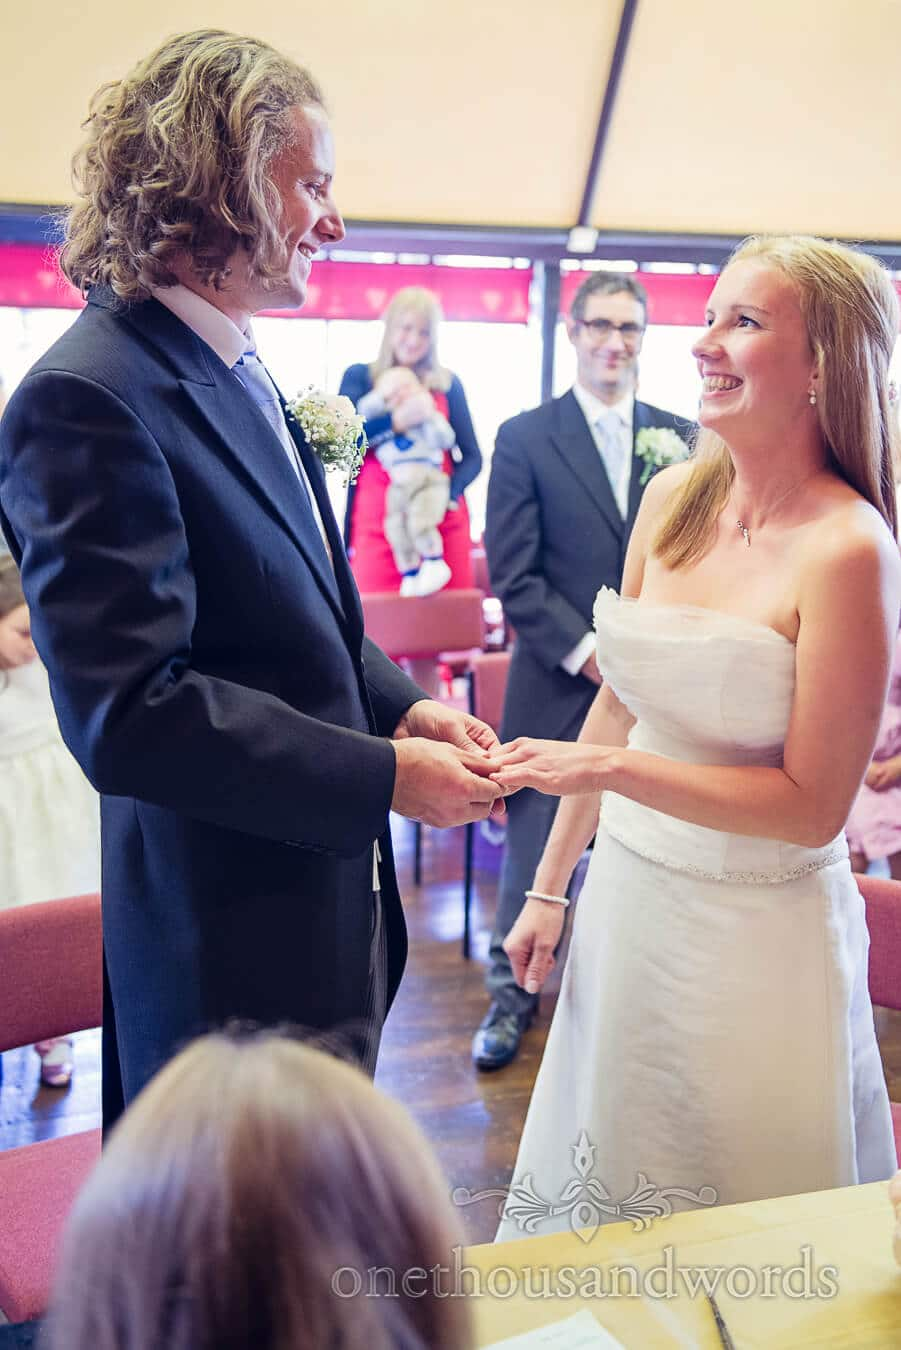 Exchange of rings at Tnebury Wells Pump Rooms wedding ceremony